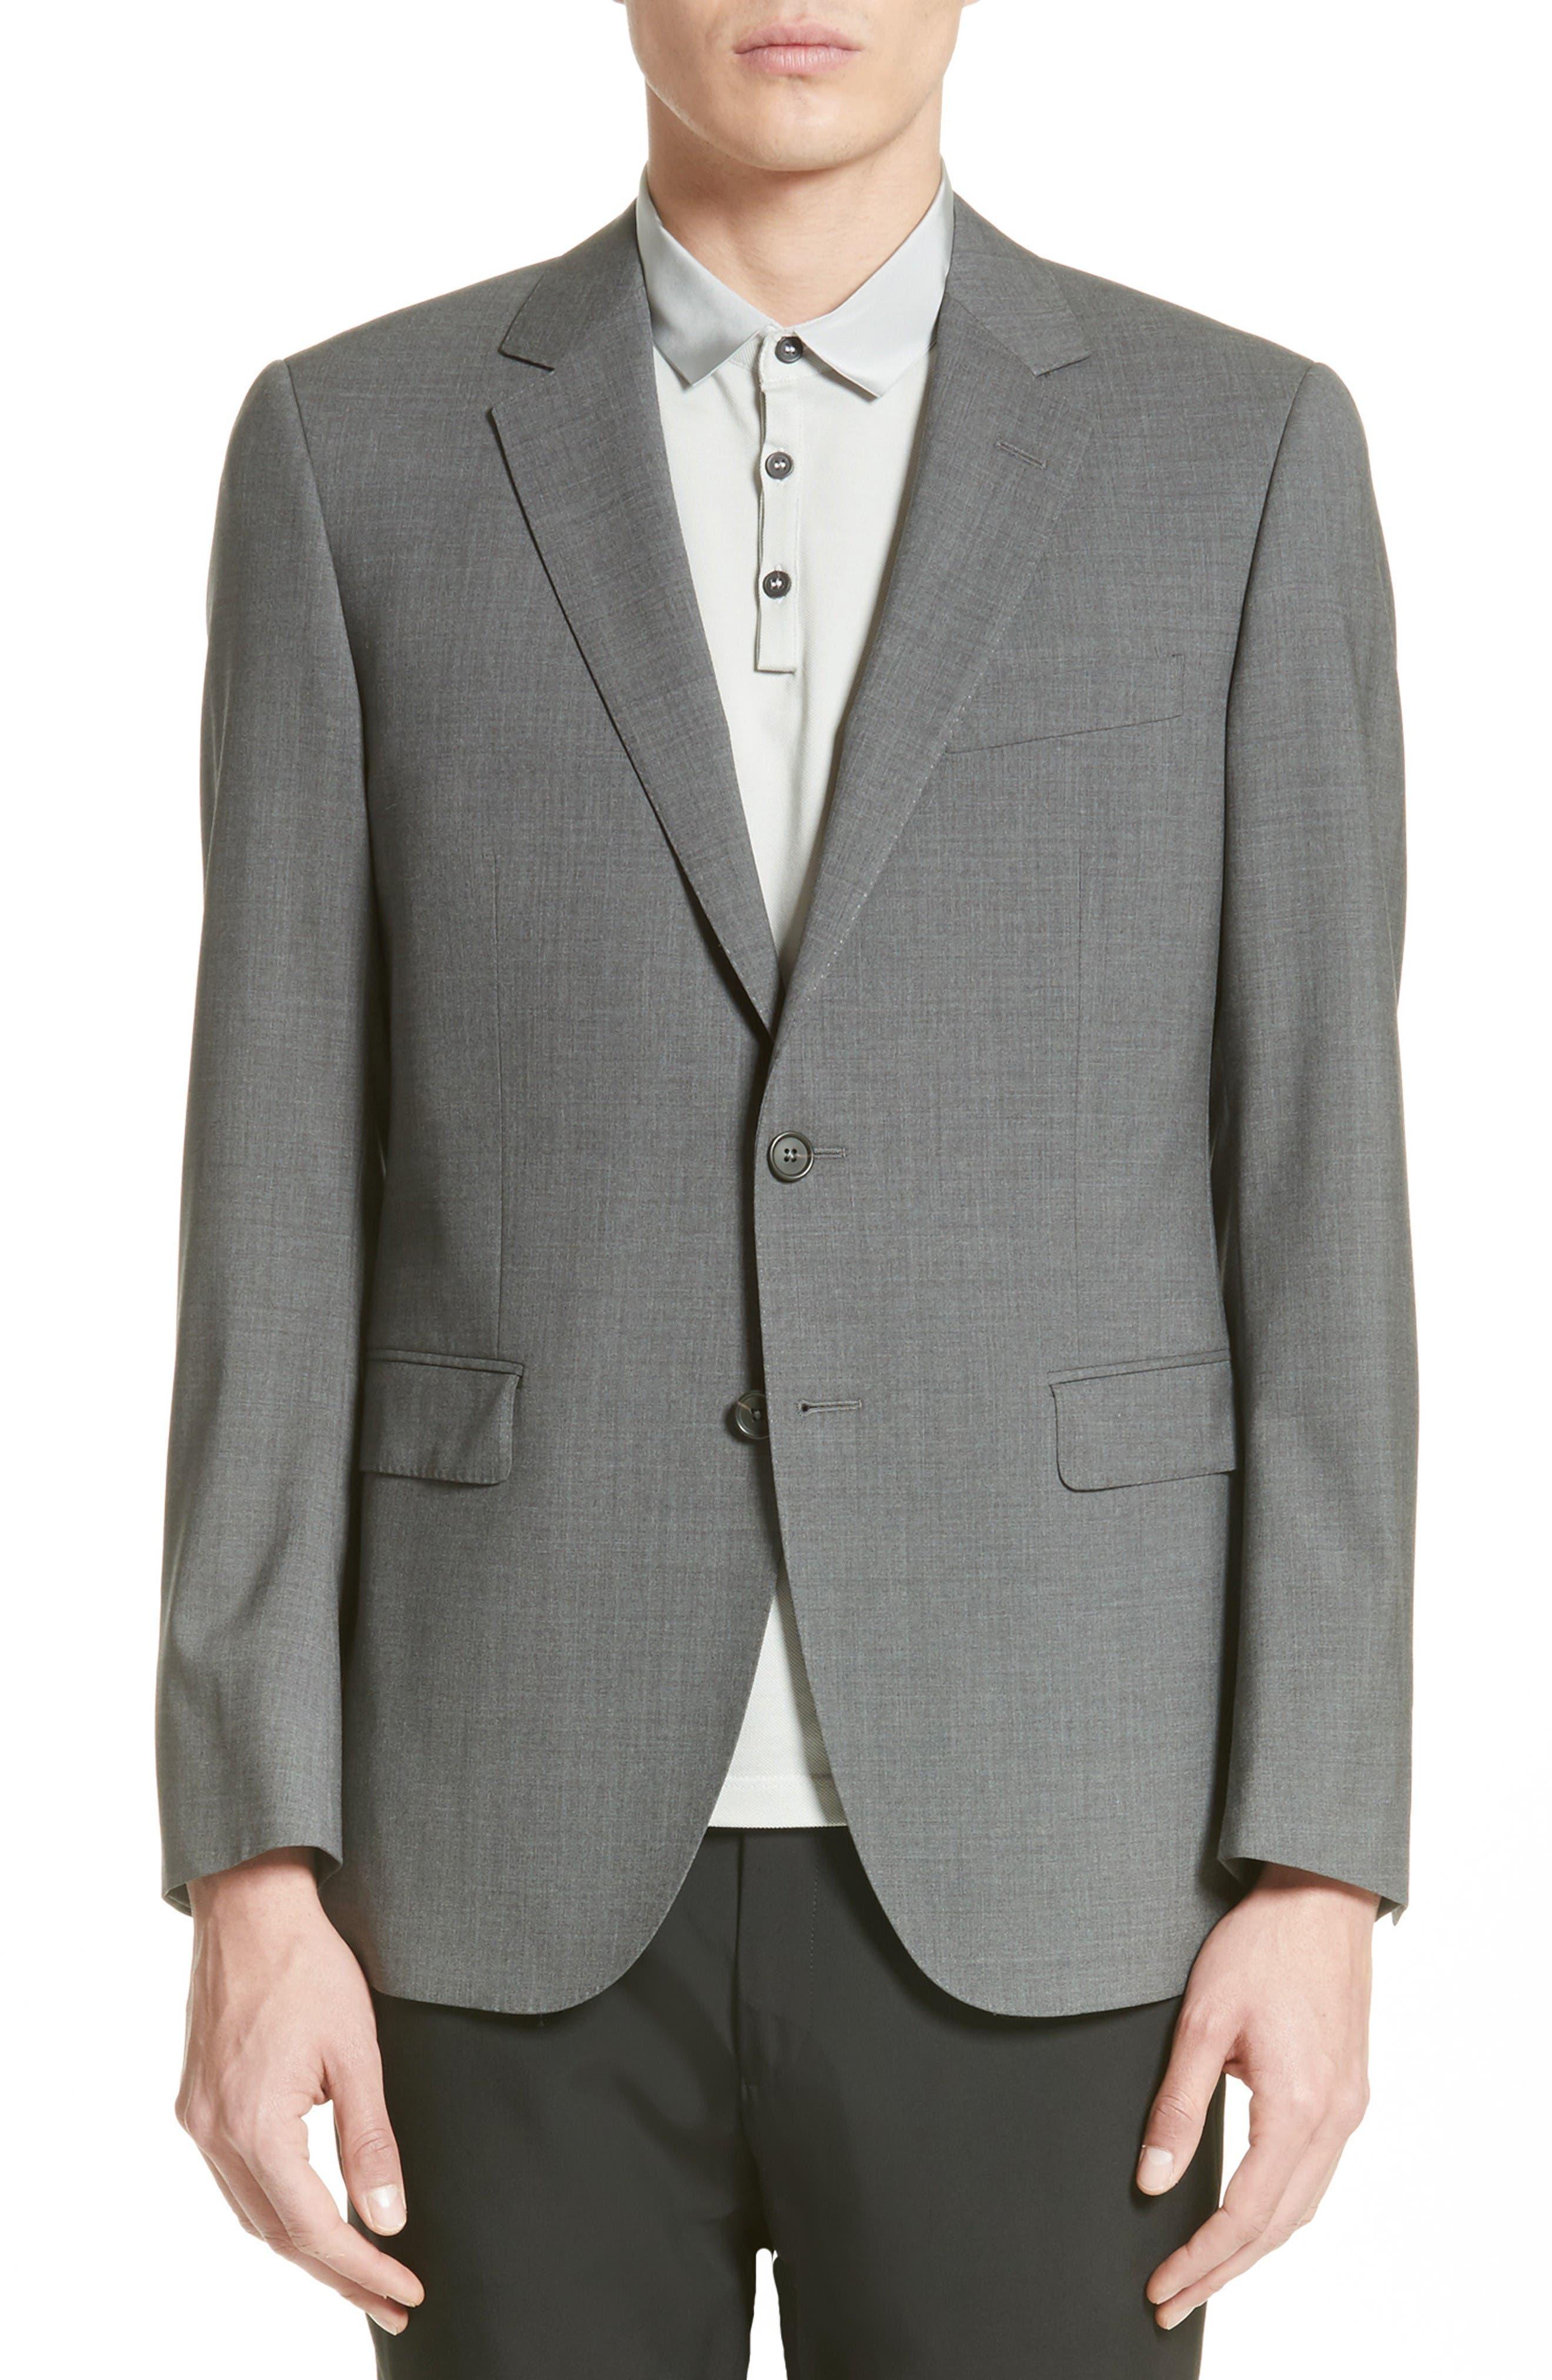 Main Image - Lanvin Tropical Wool Suit Jacket